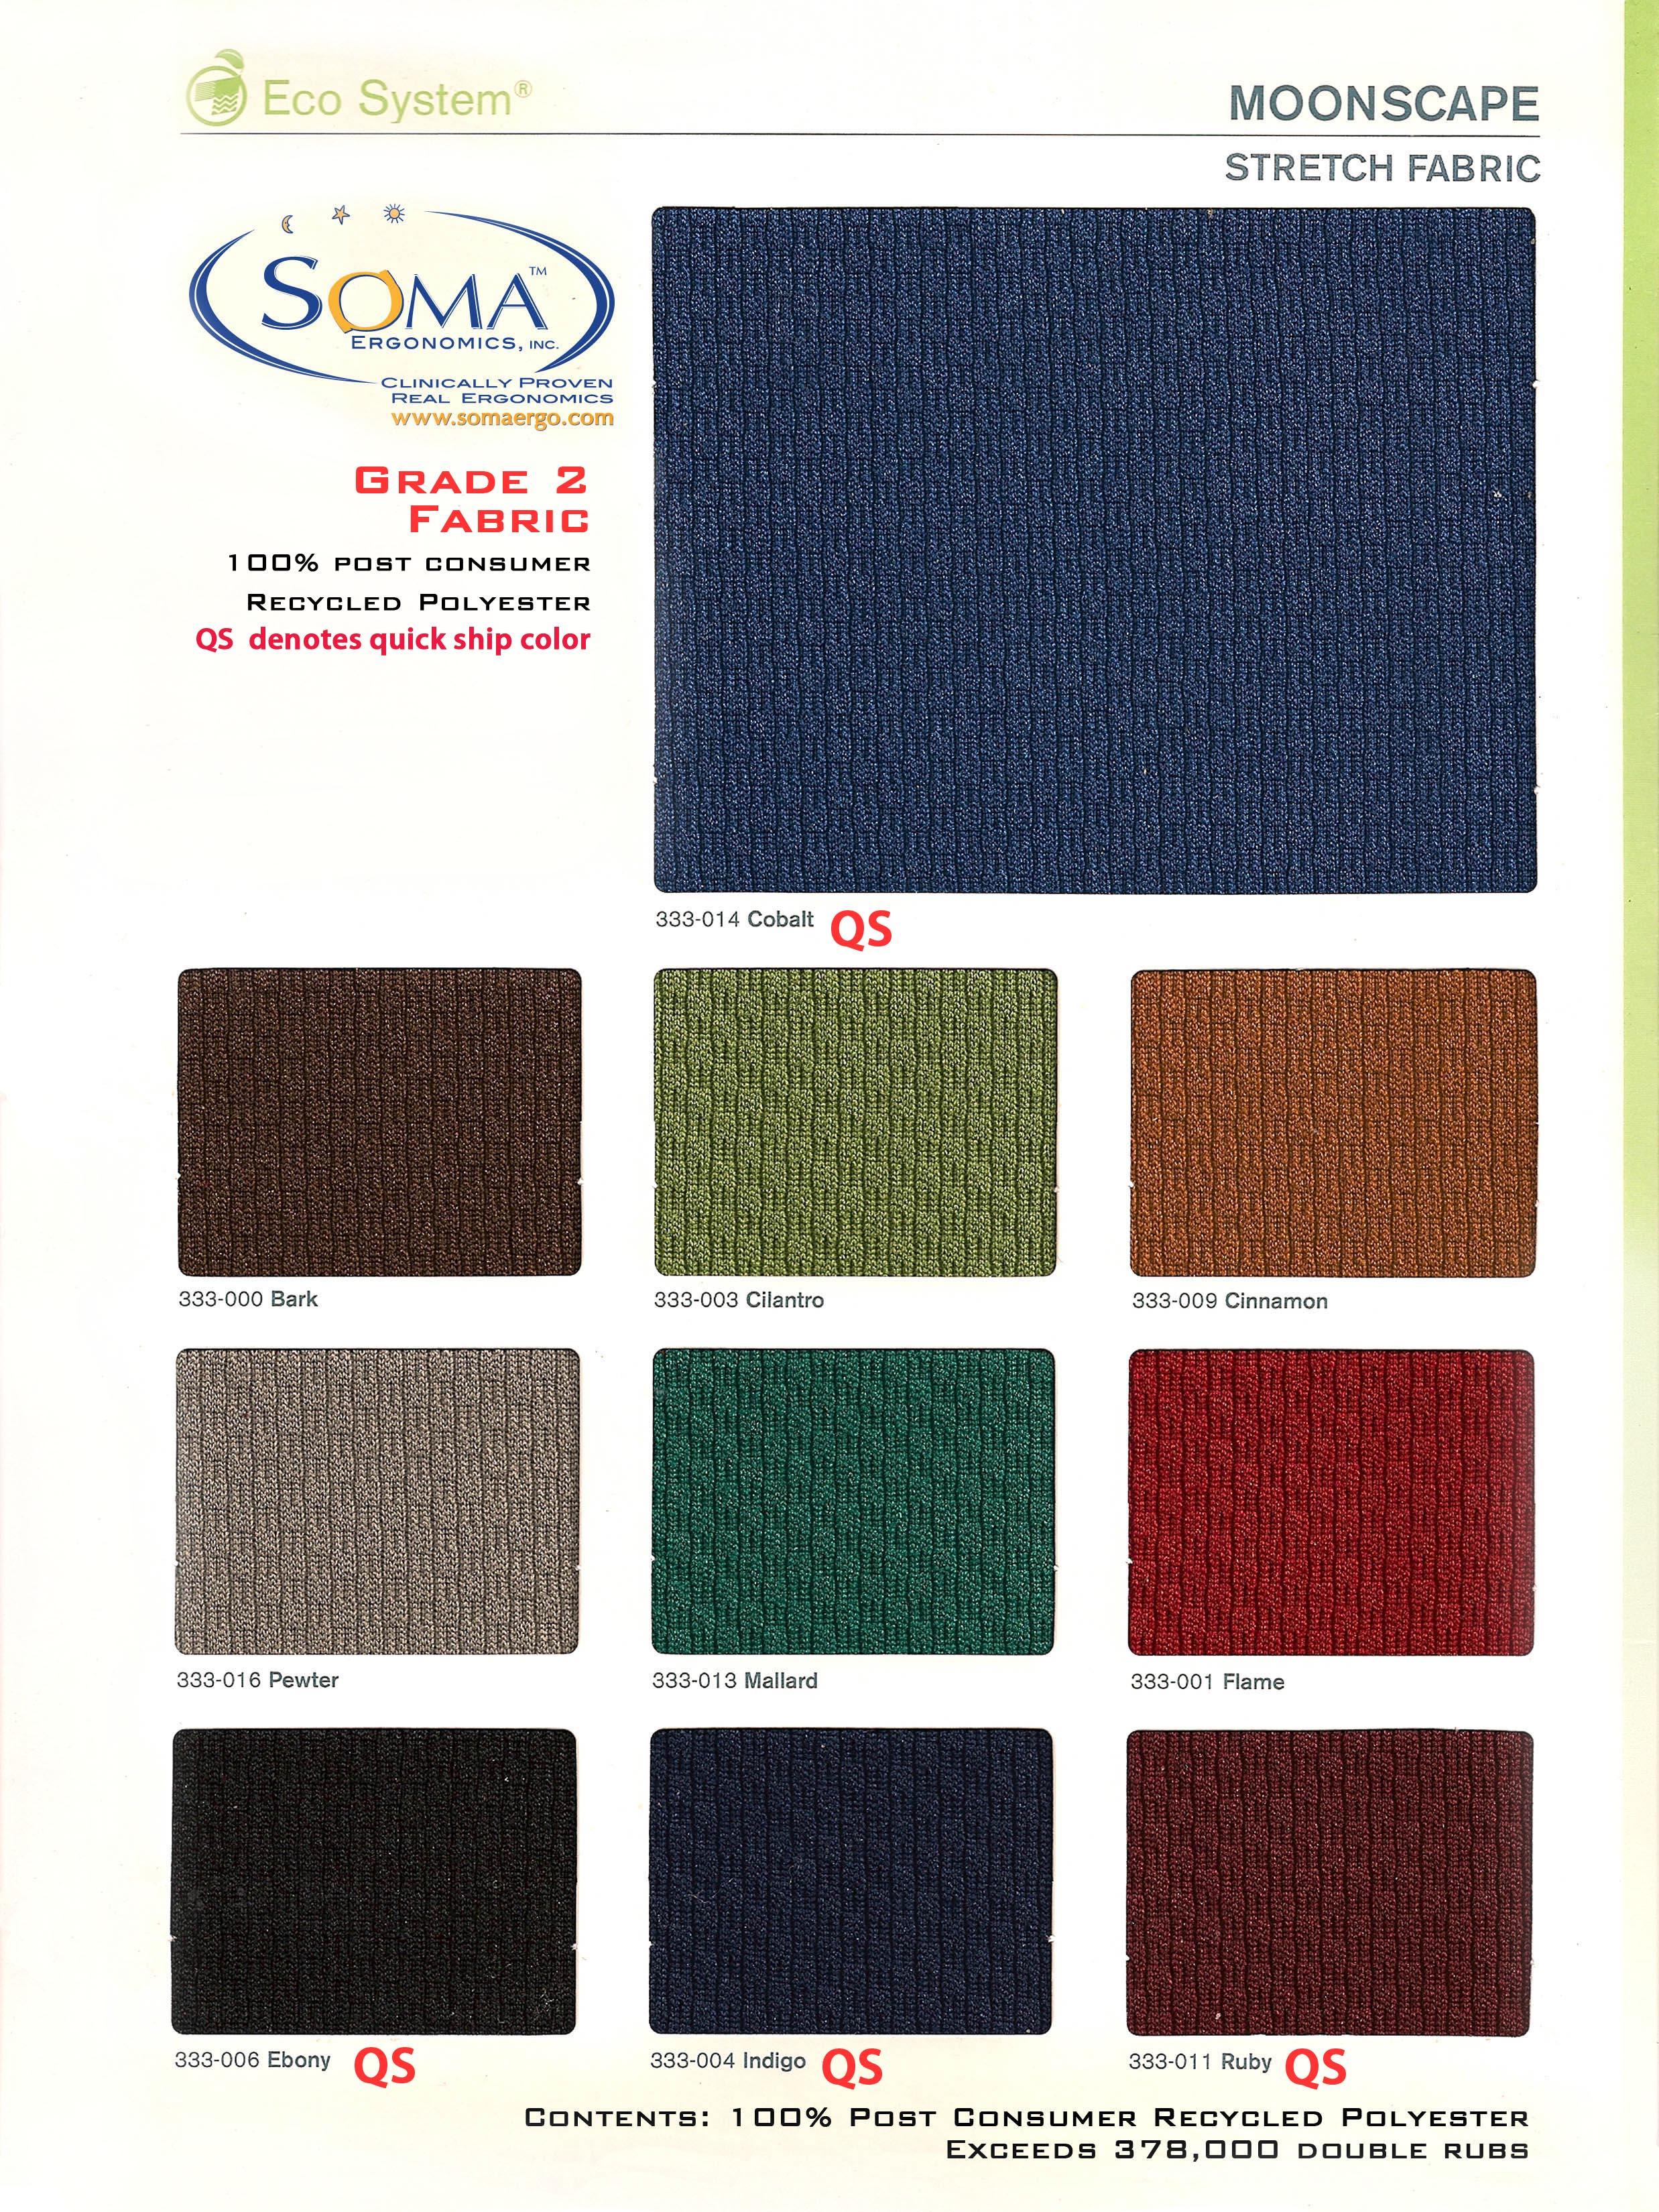 fabric-gr2-moonscape2016.s.jpg